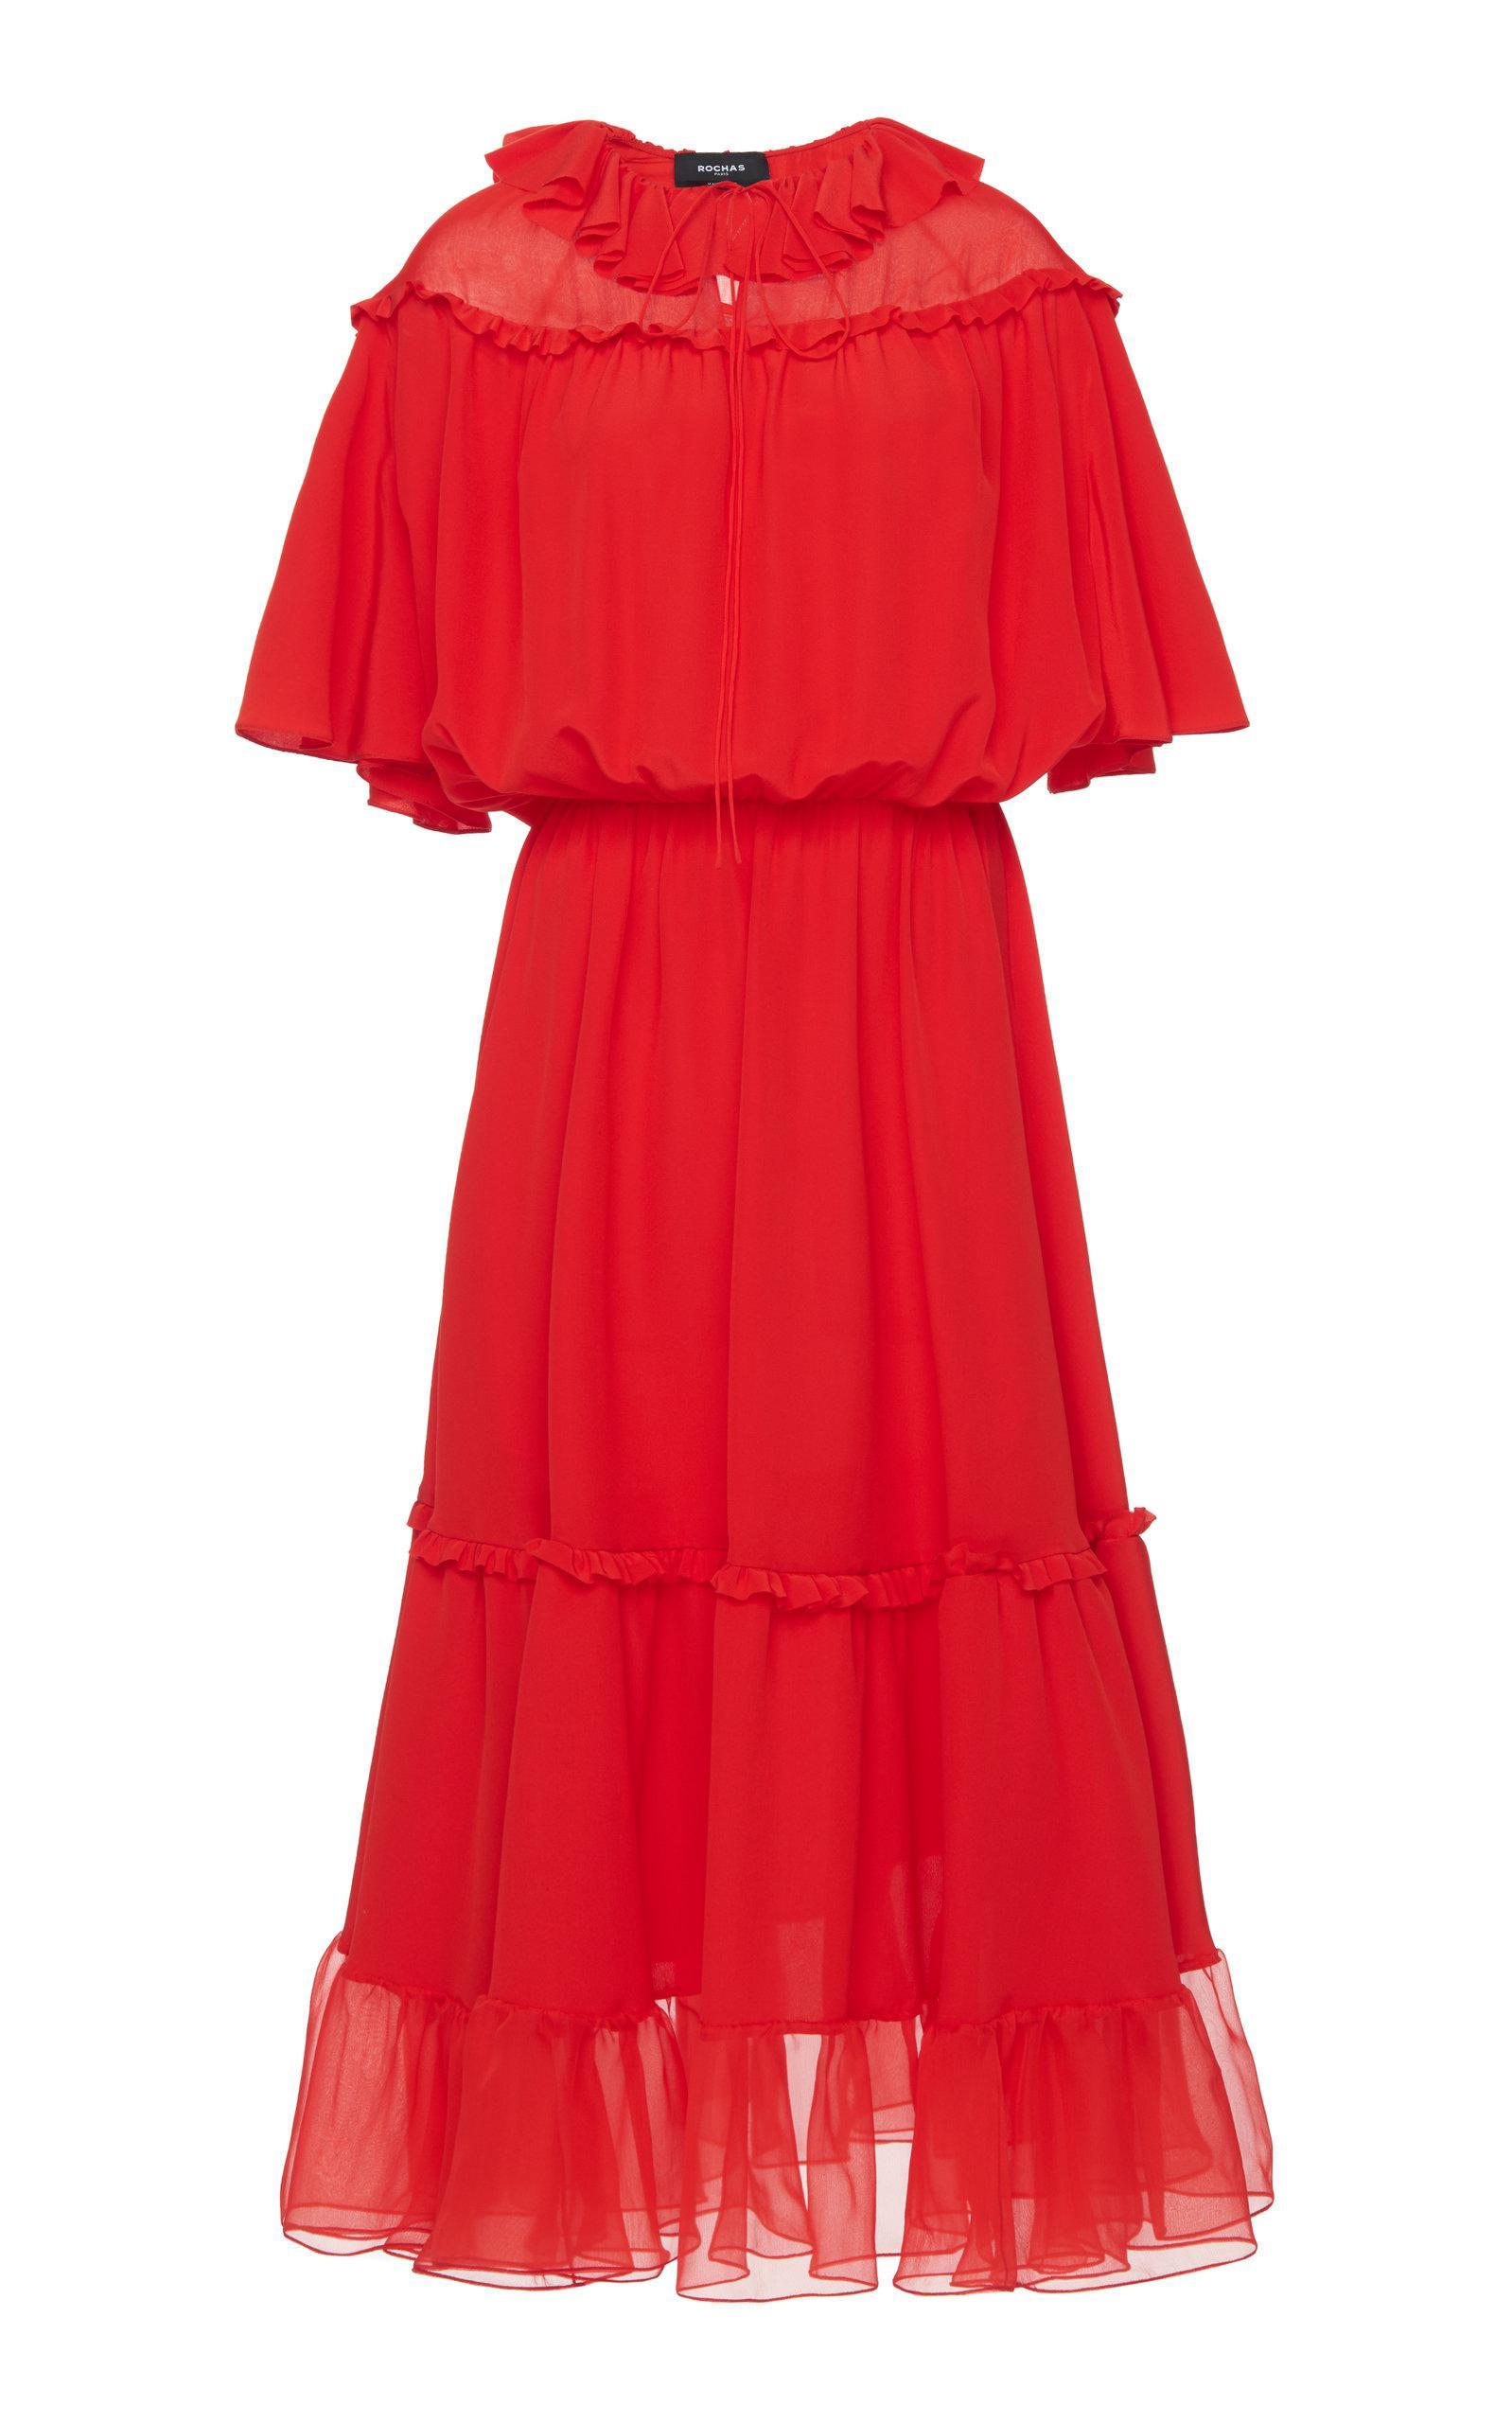 Obice Ruffle Silk Dress Rochas Discount New Styles rvX8N